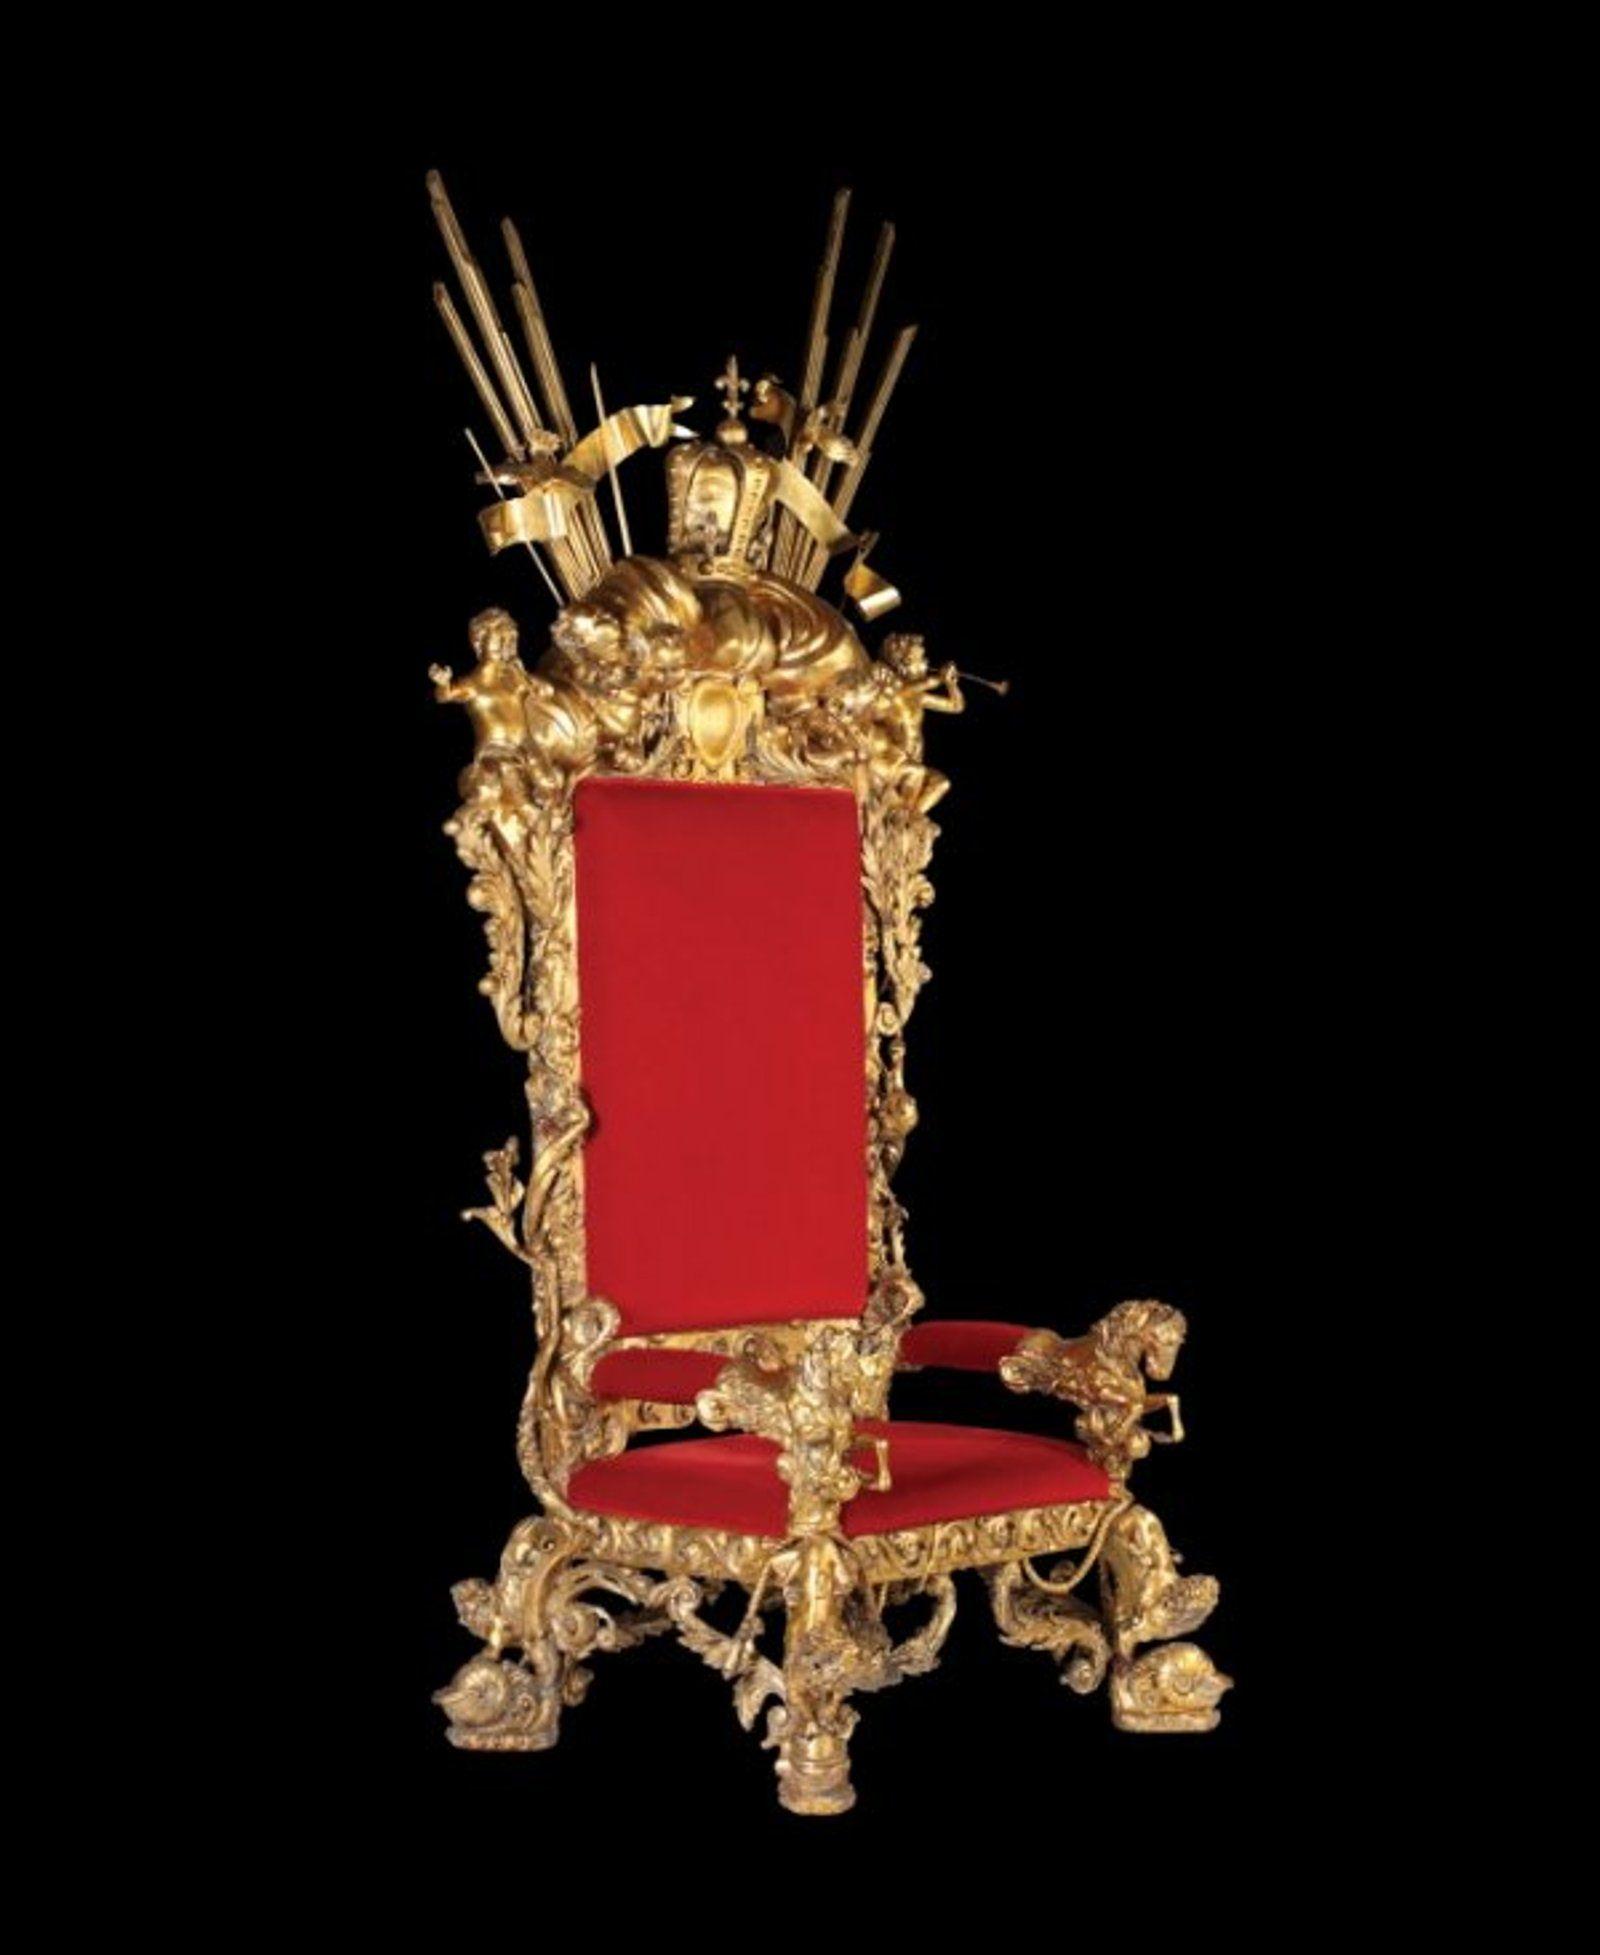 519 Monumental Gilded Throne Art Decor Michael Jackson Art Chair